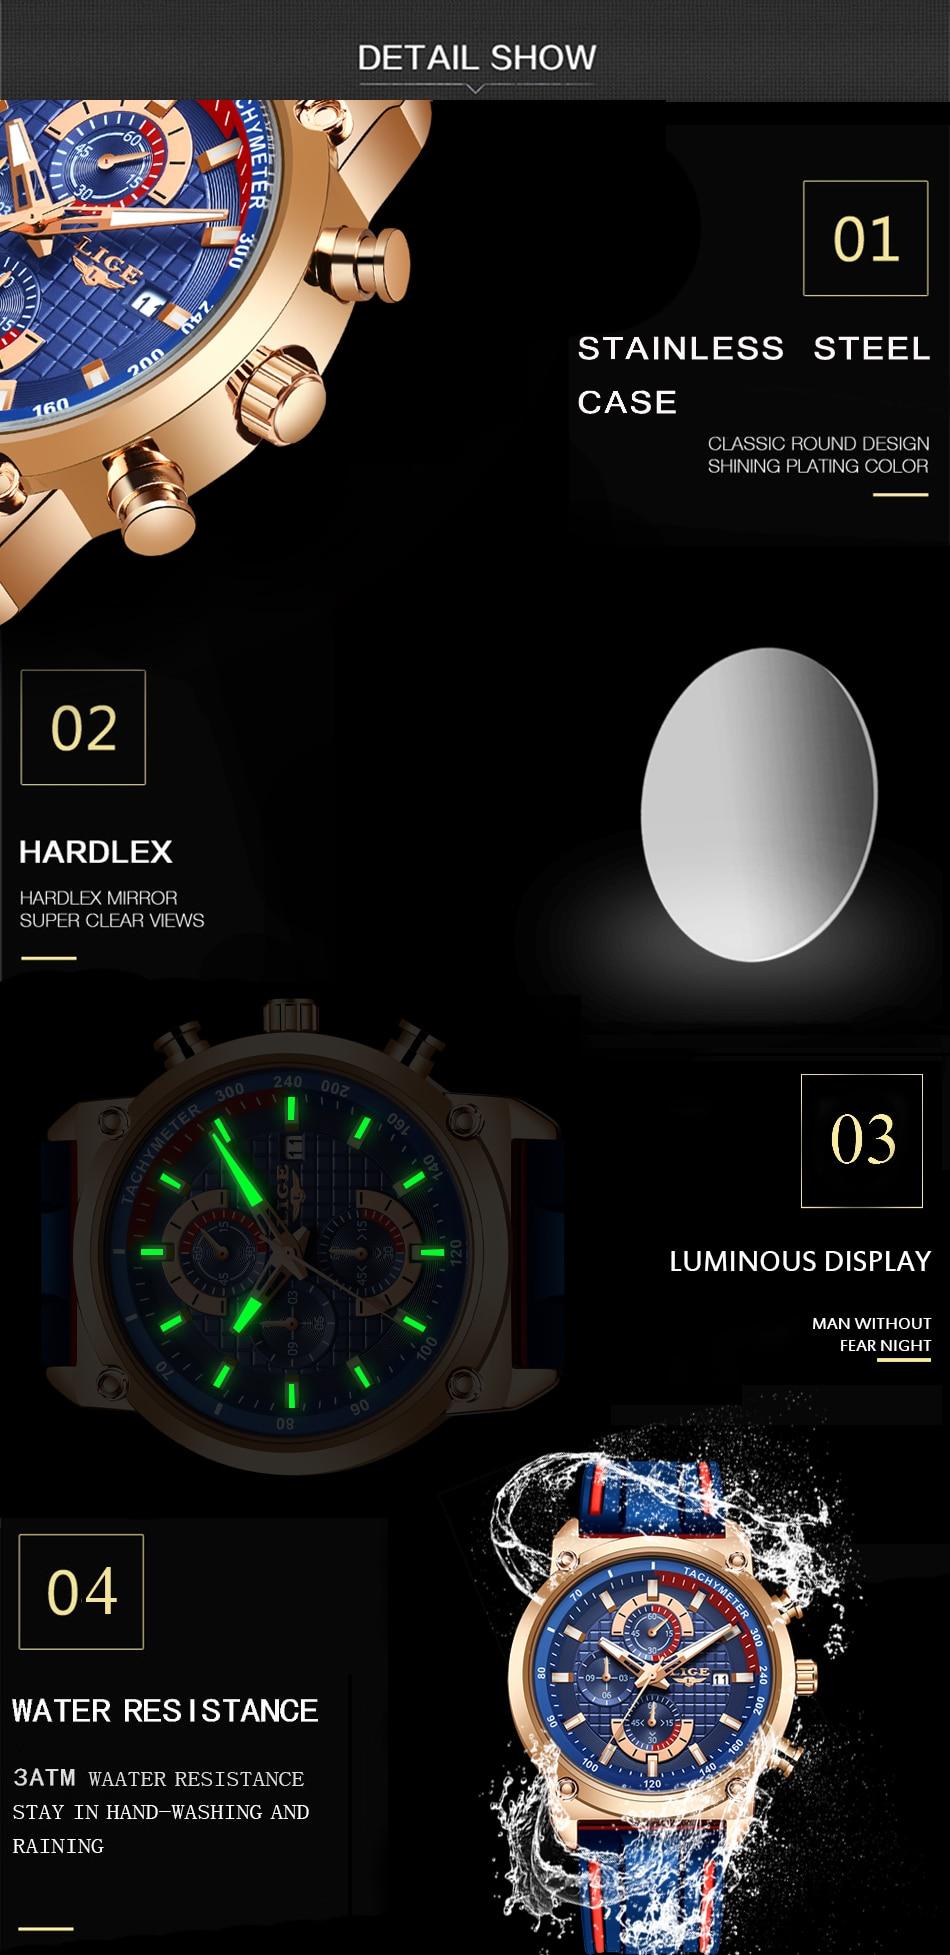 Hfe61350a376844439baf1a34c7bad023g New Top Fashion Chronograph Quartz Men Watches LIGE Silicone Strap Date Wristwatch Clock Male Luminous Watch Relogio Masculino